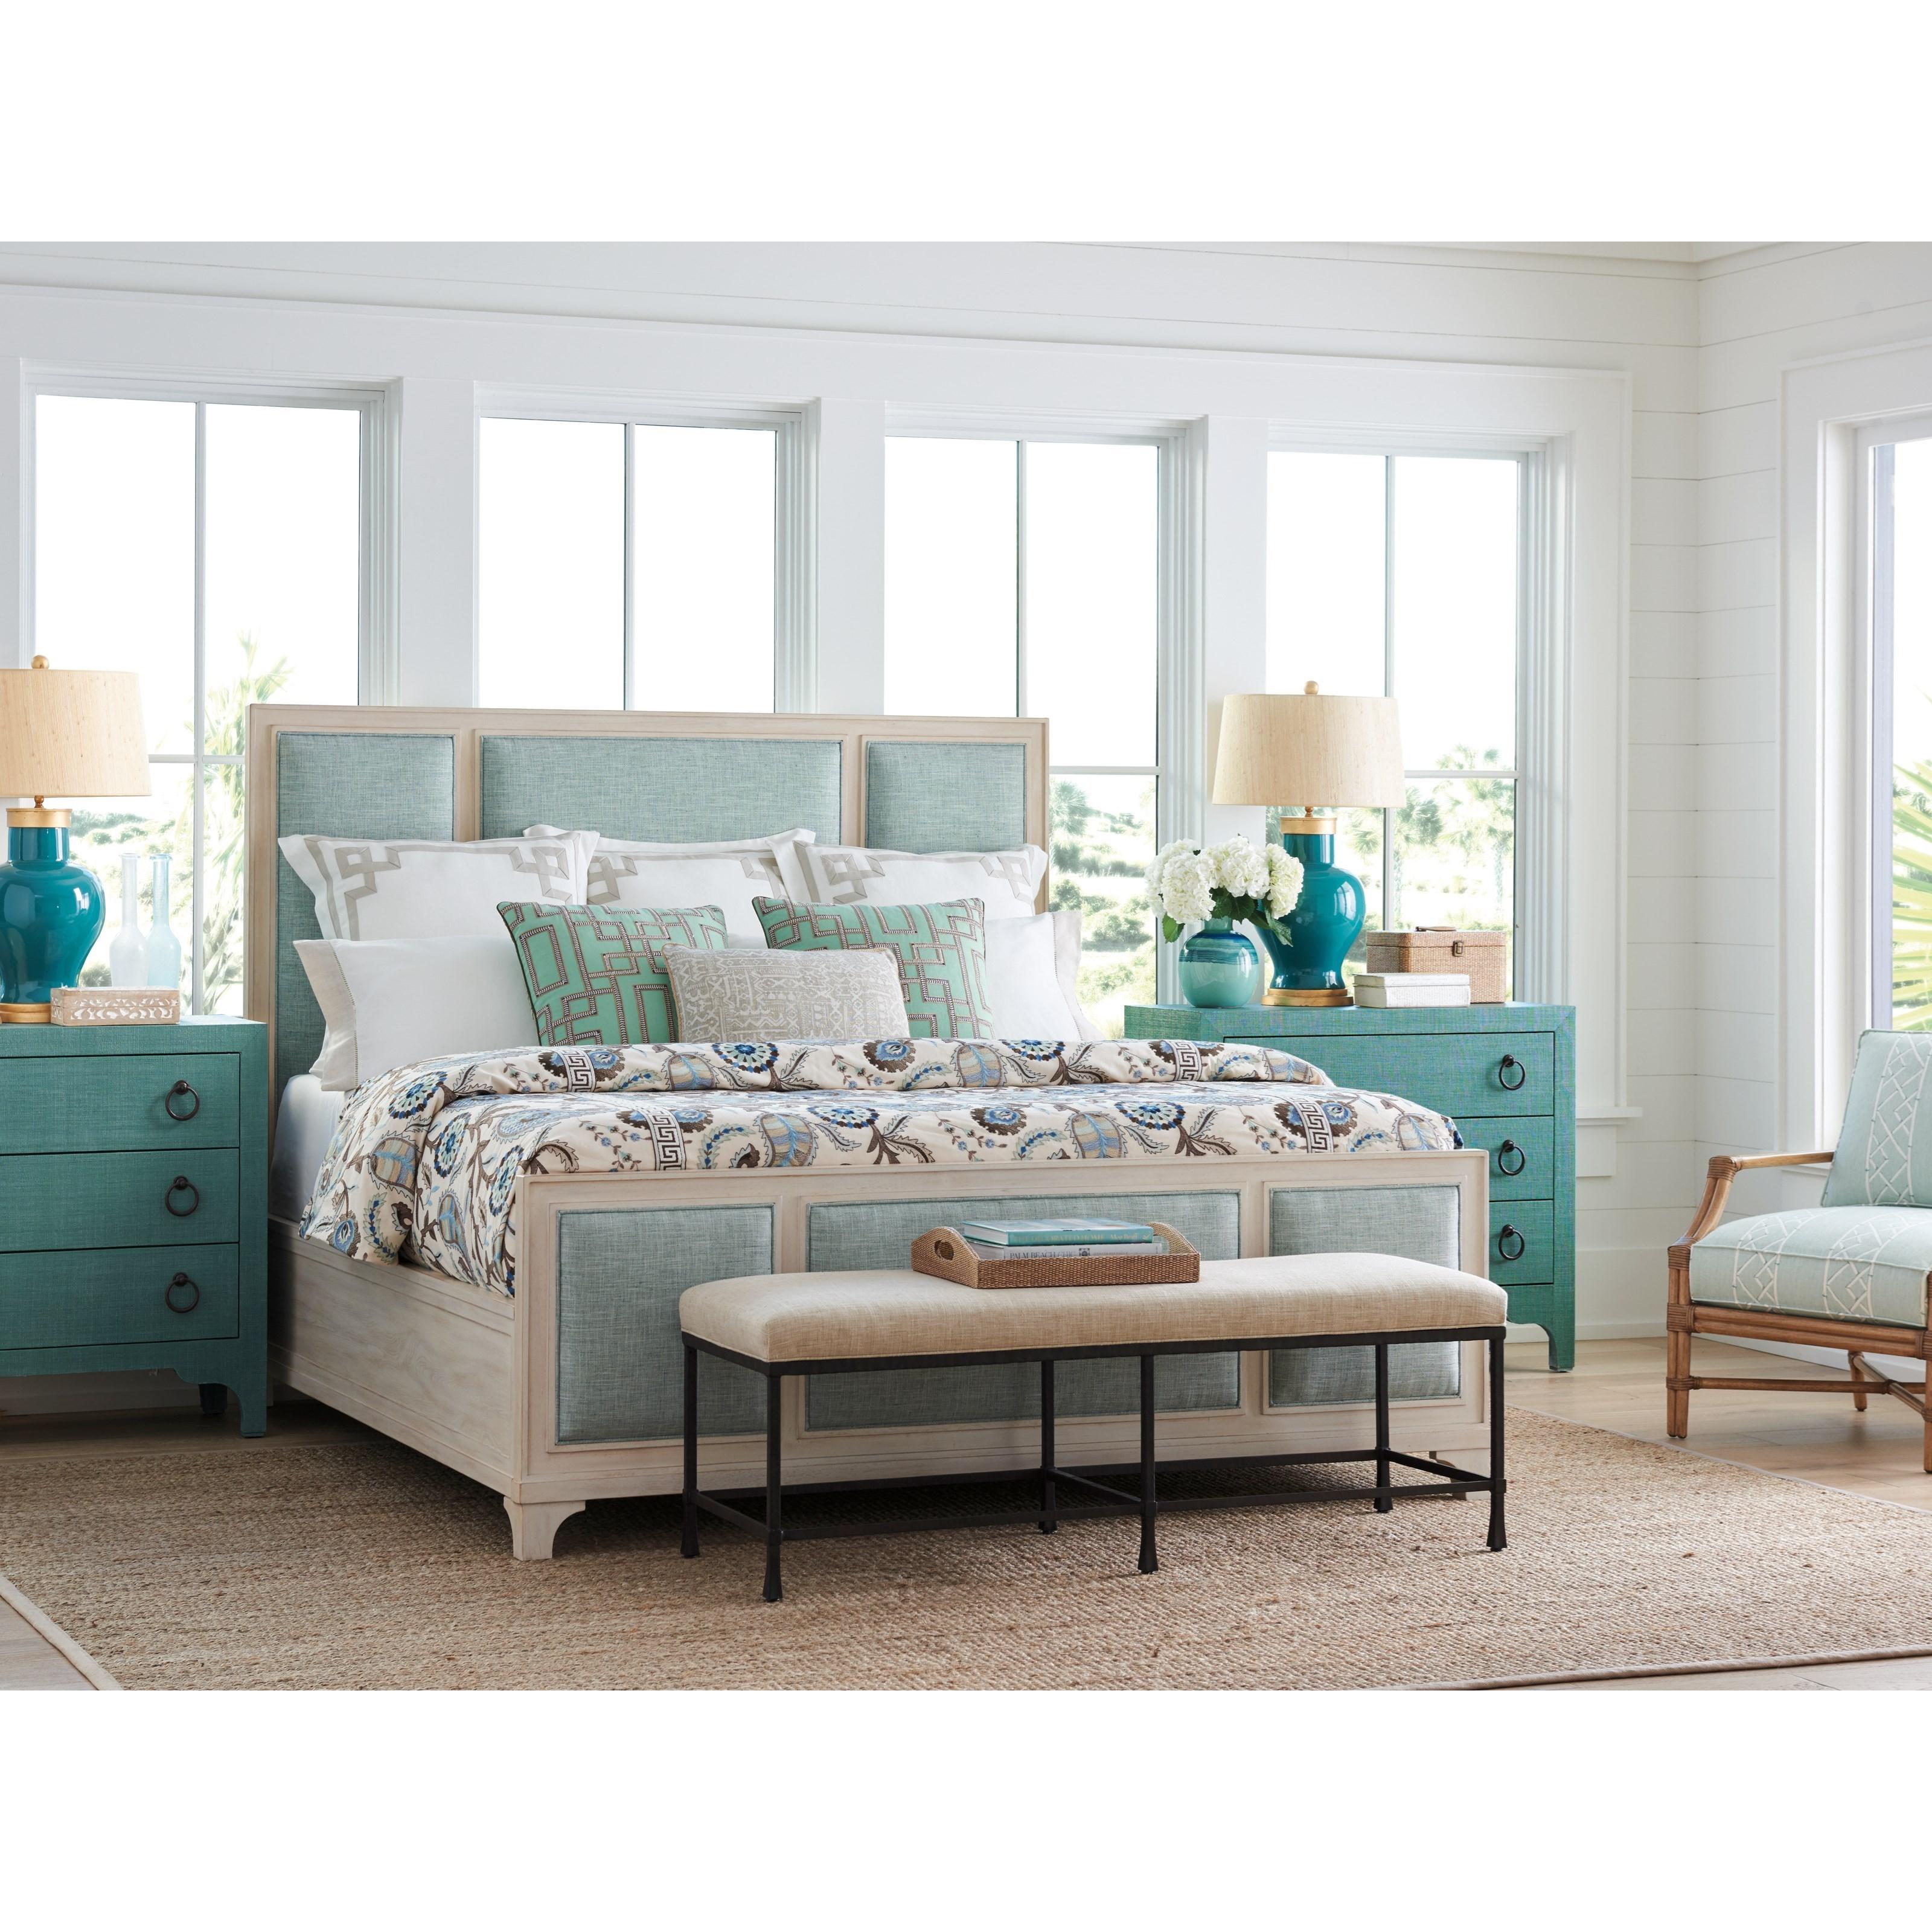 Newport King Bedroom Group by Barclay Butera at Johnny Janosik